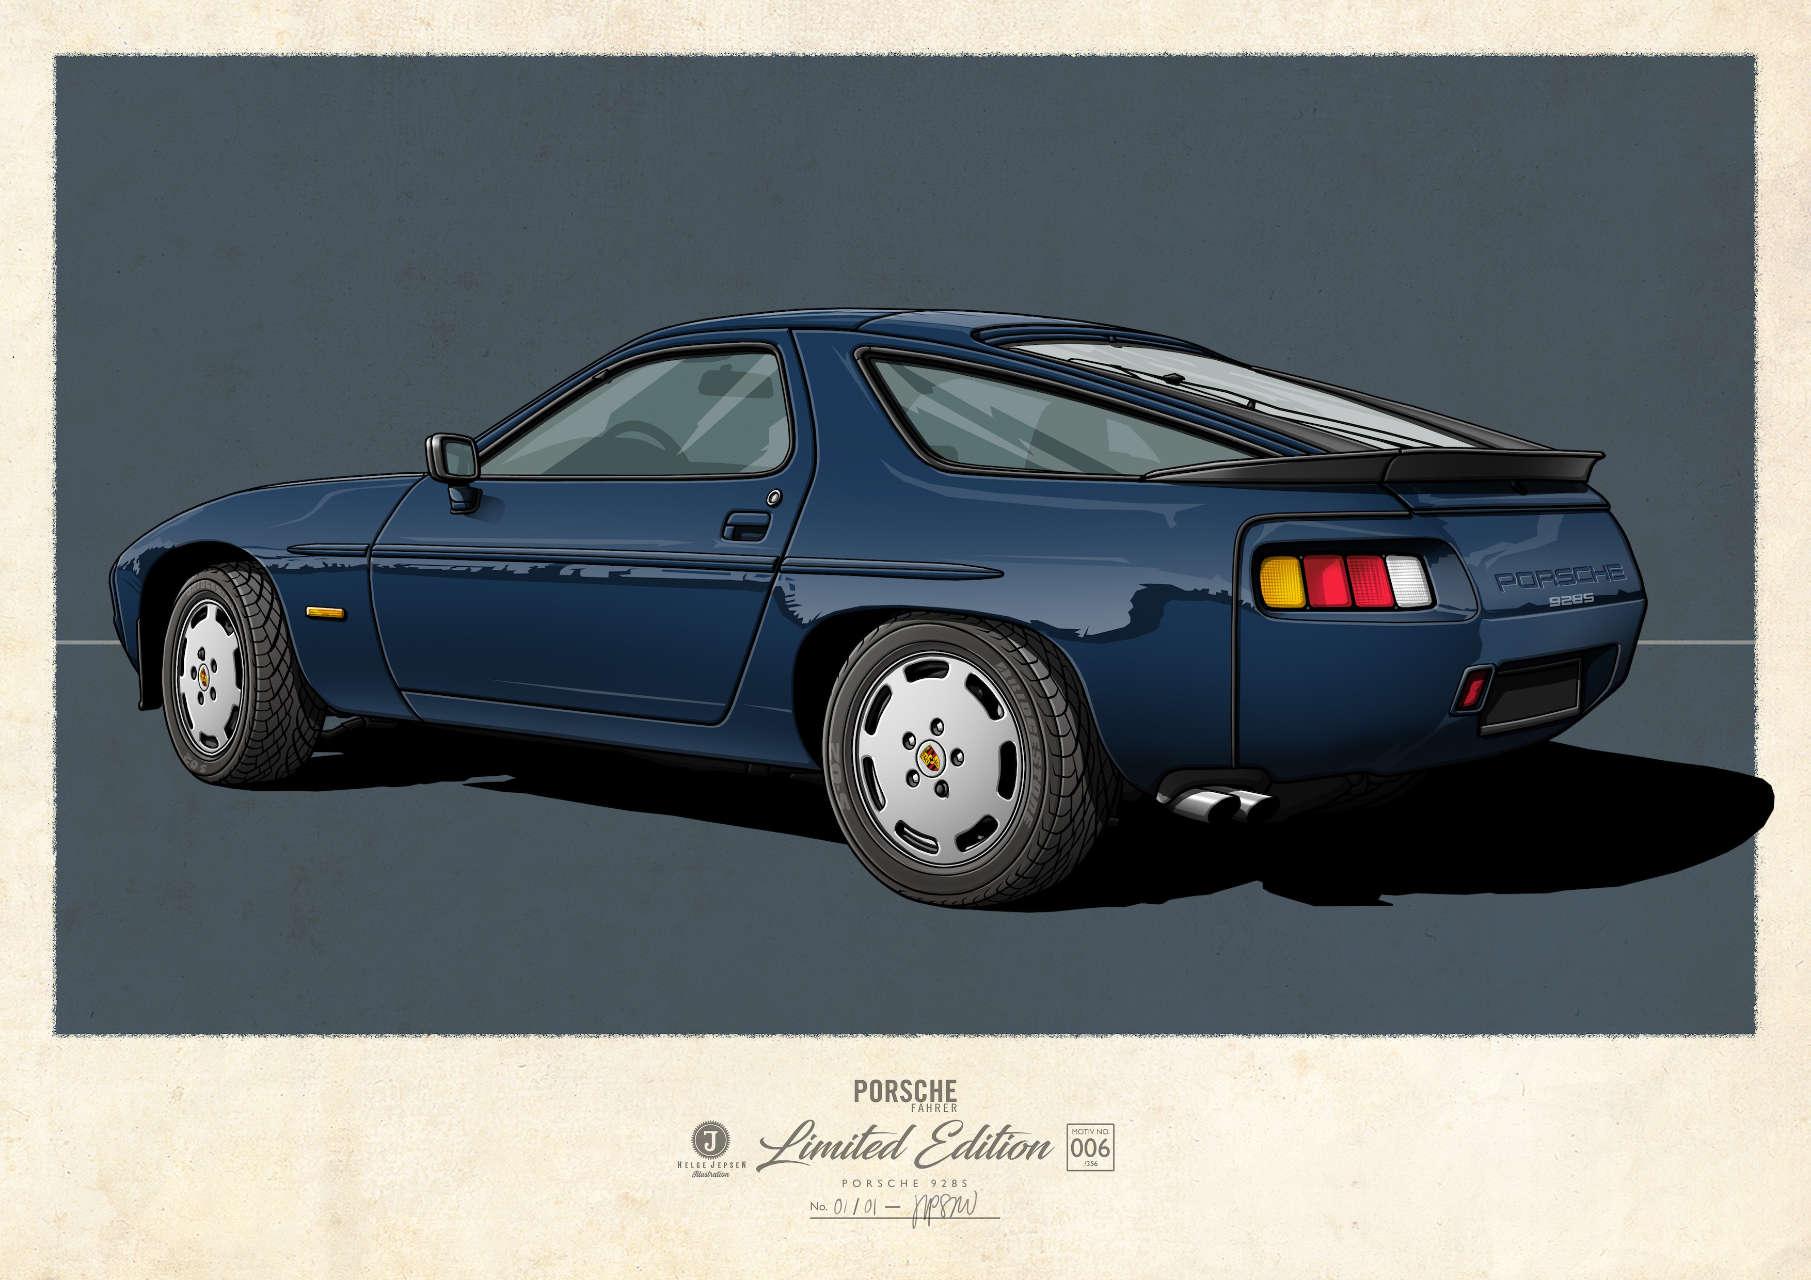 Porsche 928S Kunstwerk